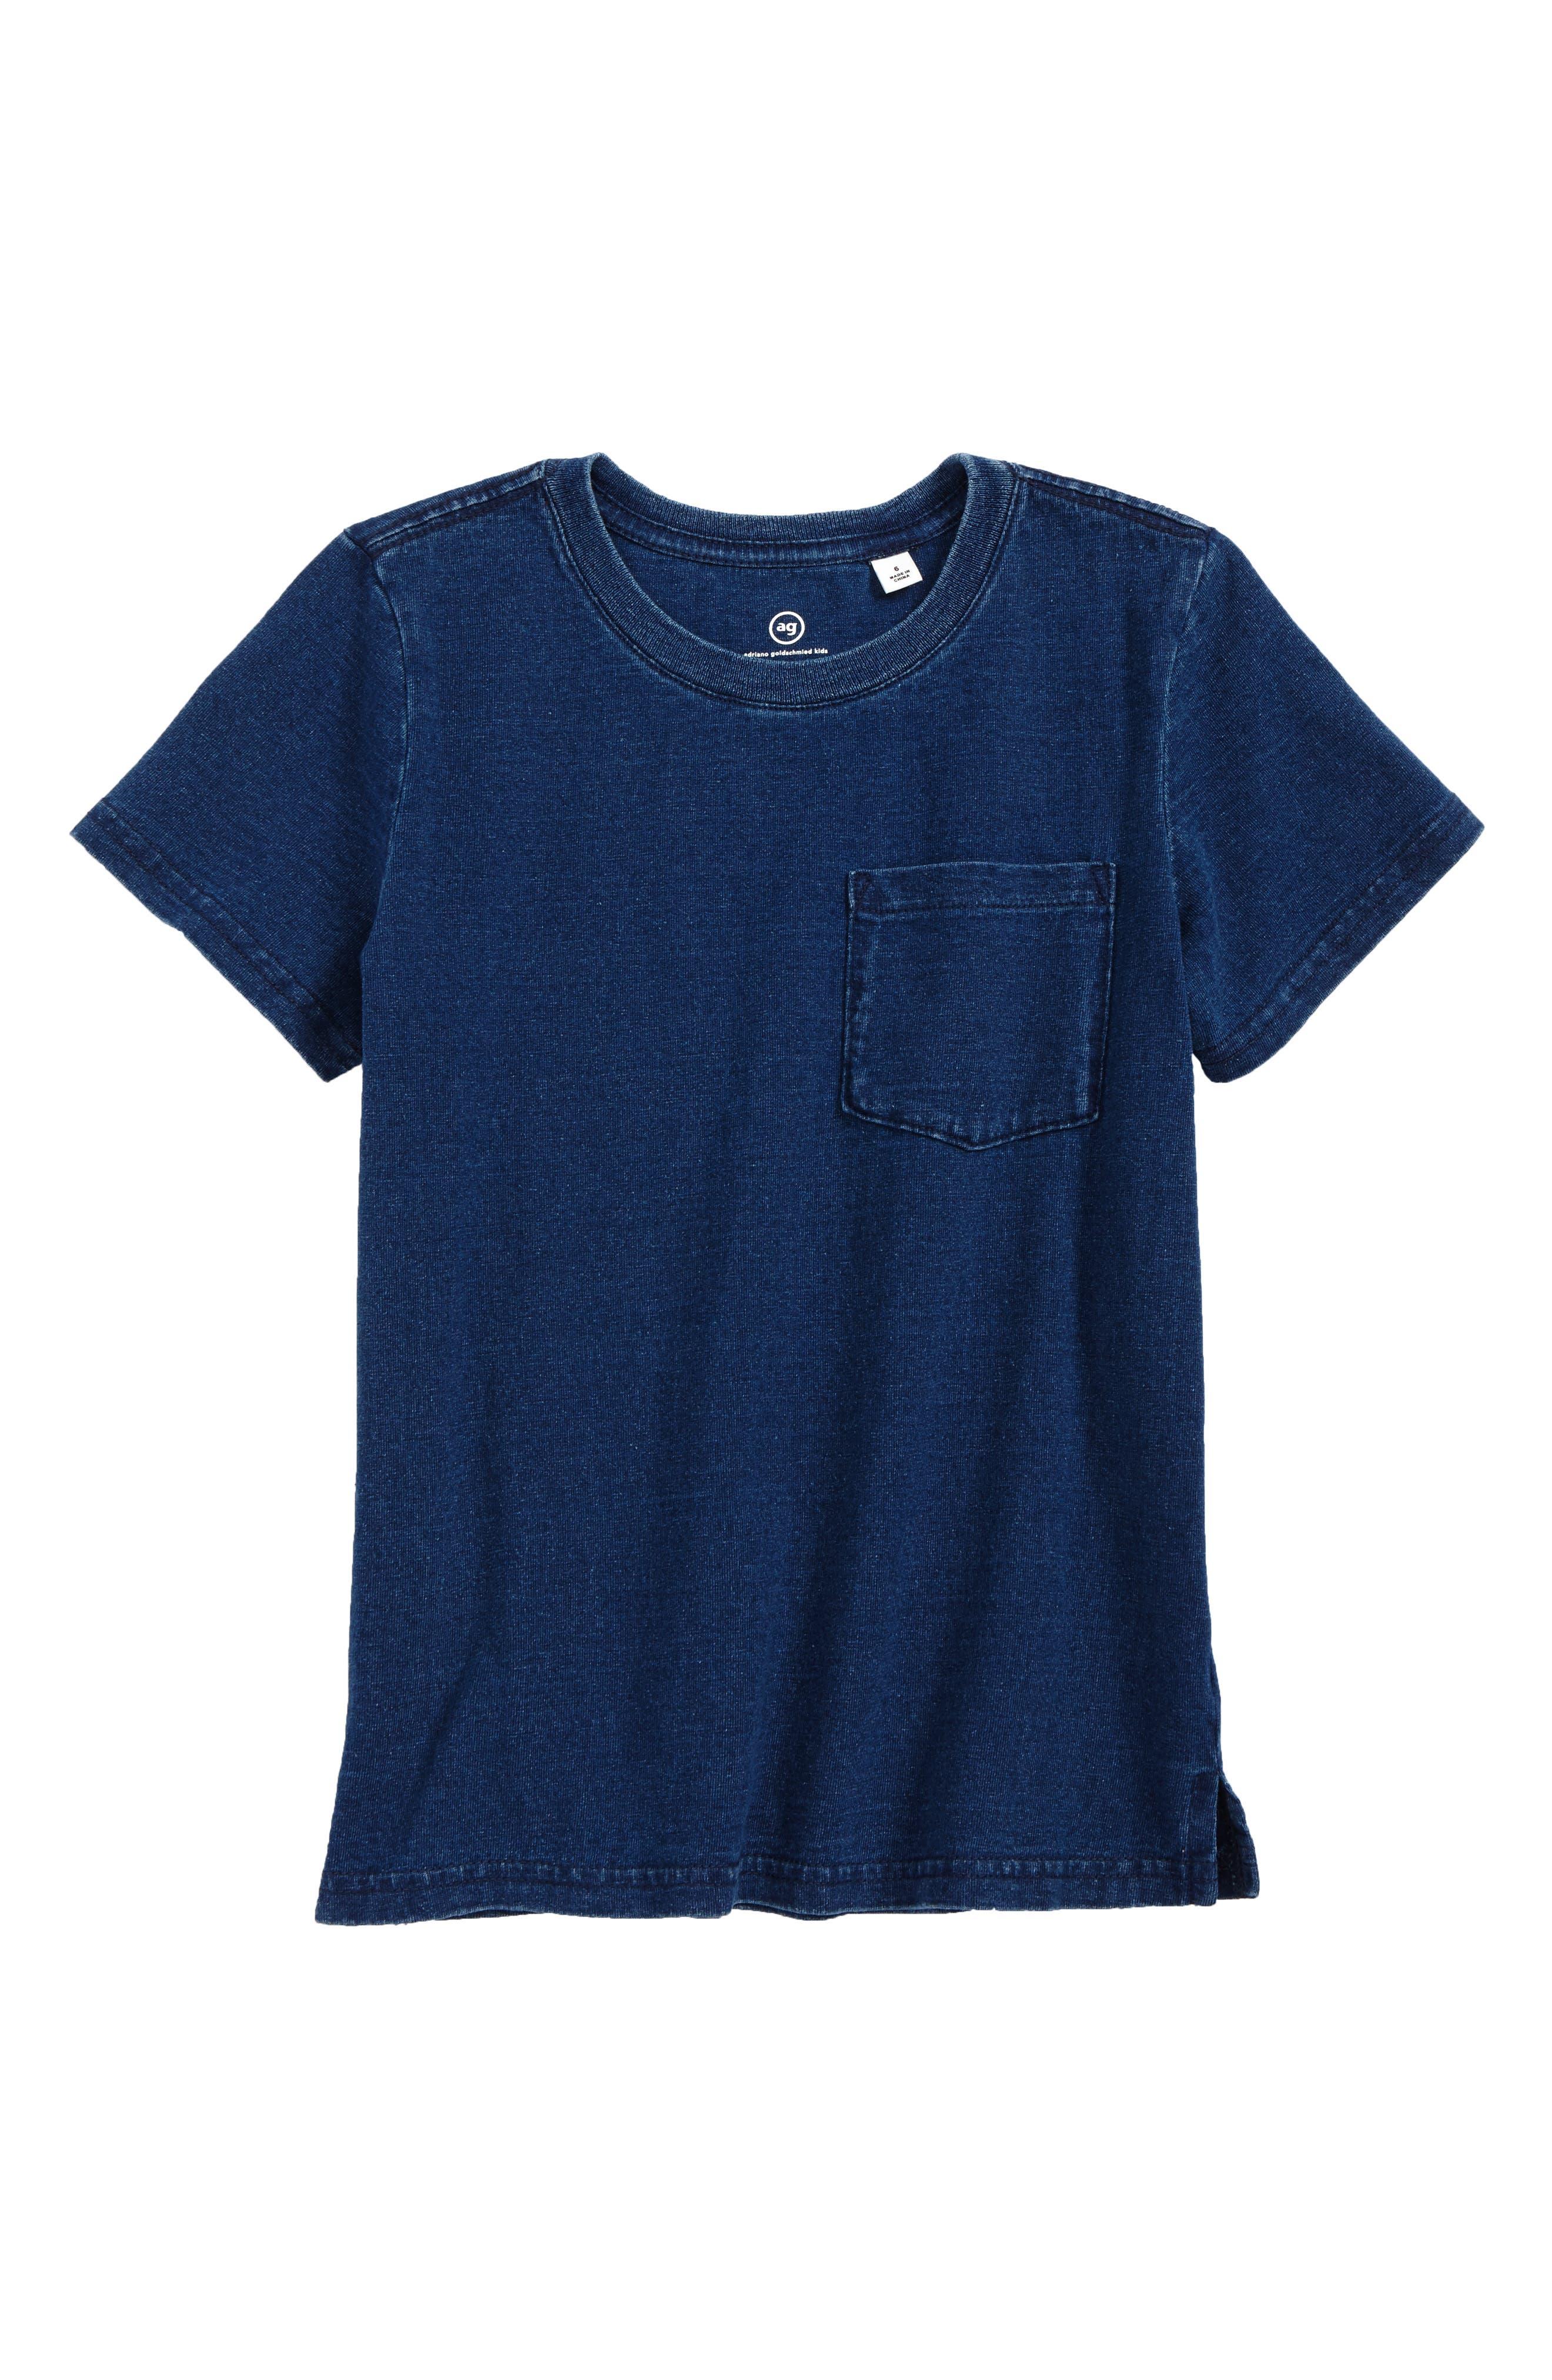 AG Pigment T-Shirt,                             Main thumbnail 1, color,                             Slate Indigo